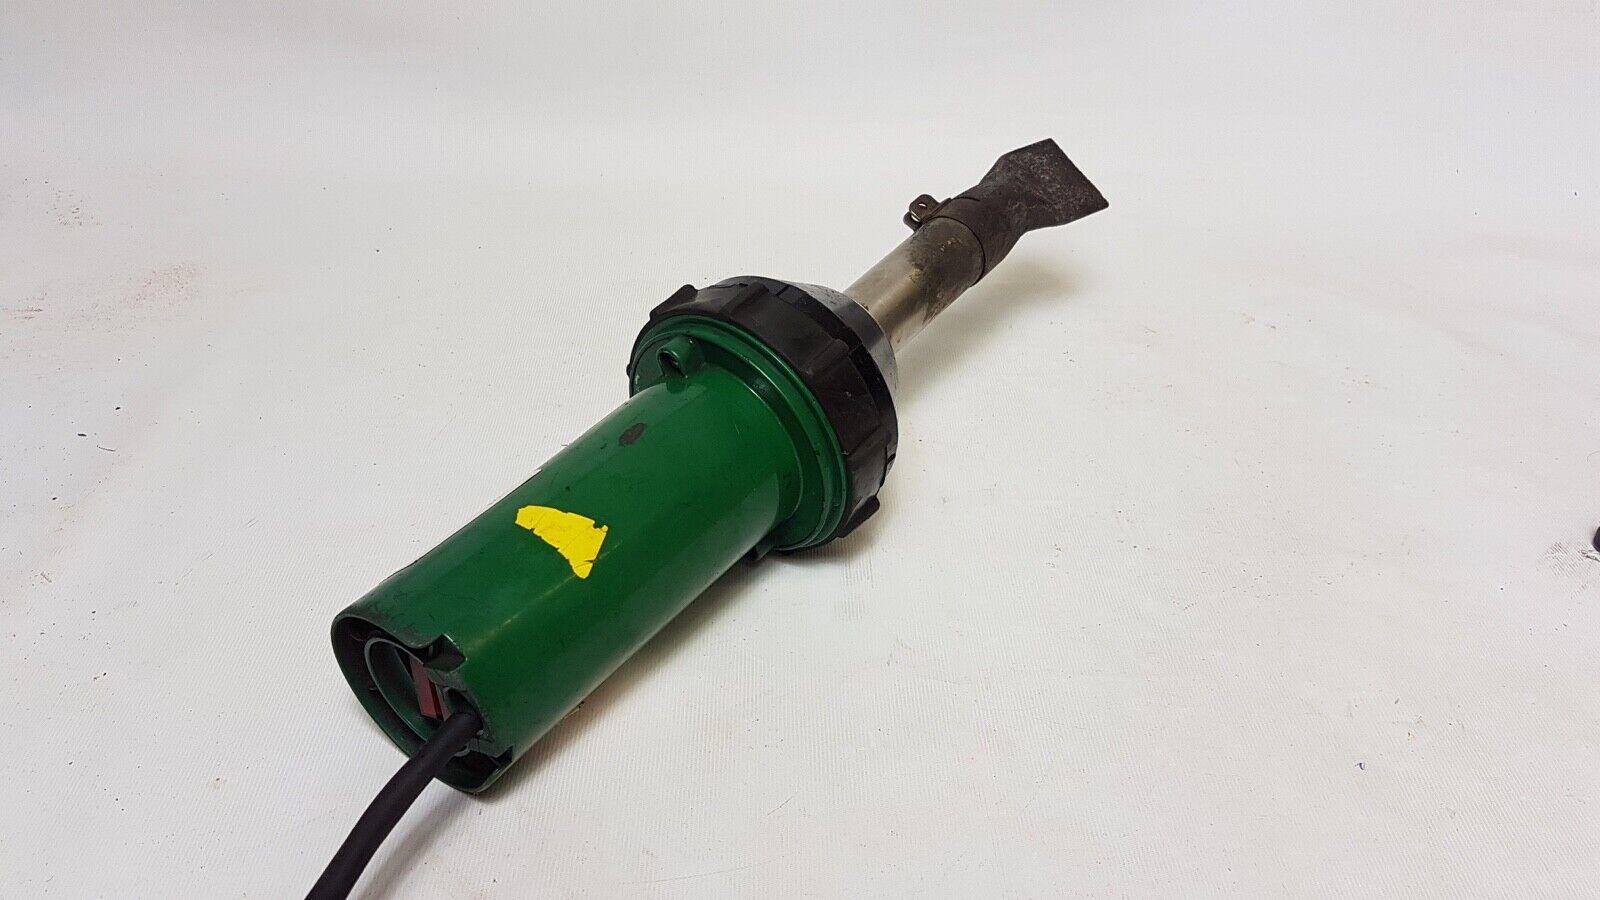 Leister Triac Heat Gun Flooring Plastic Welding